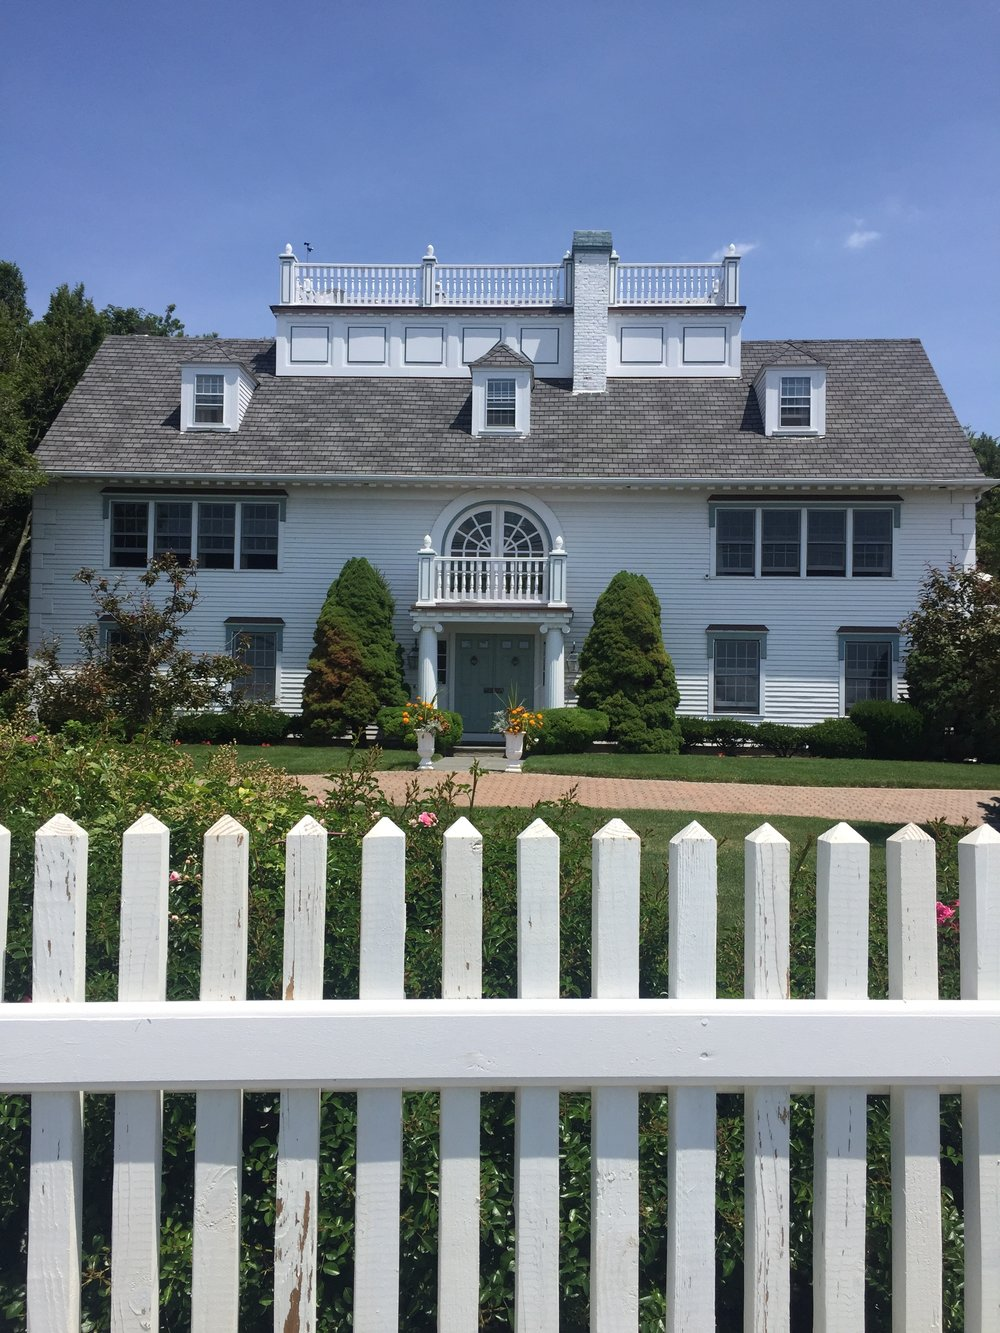 White house white trim Marblehead MA New England USA.jpg